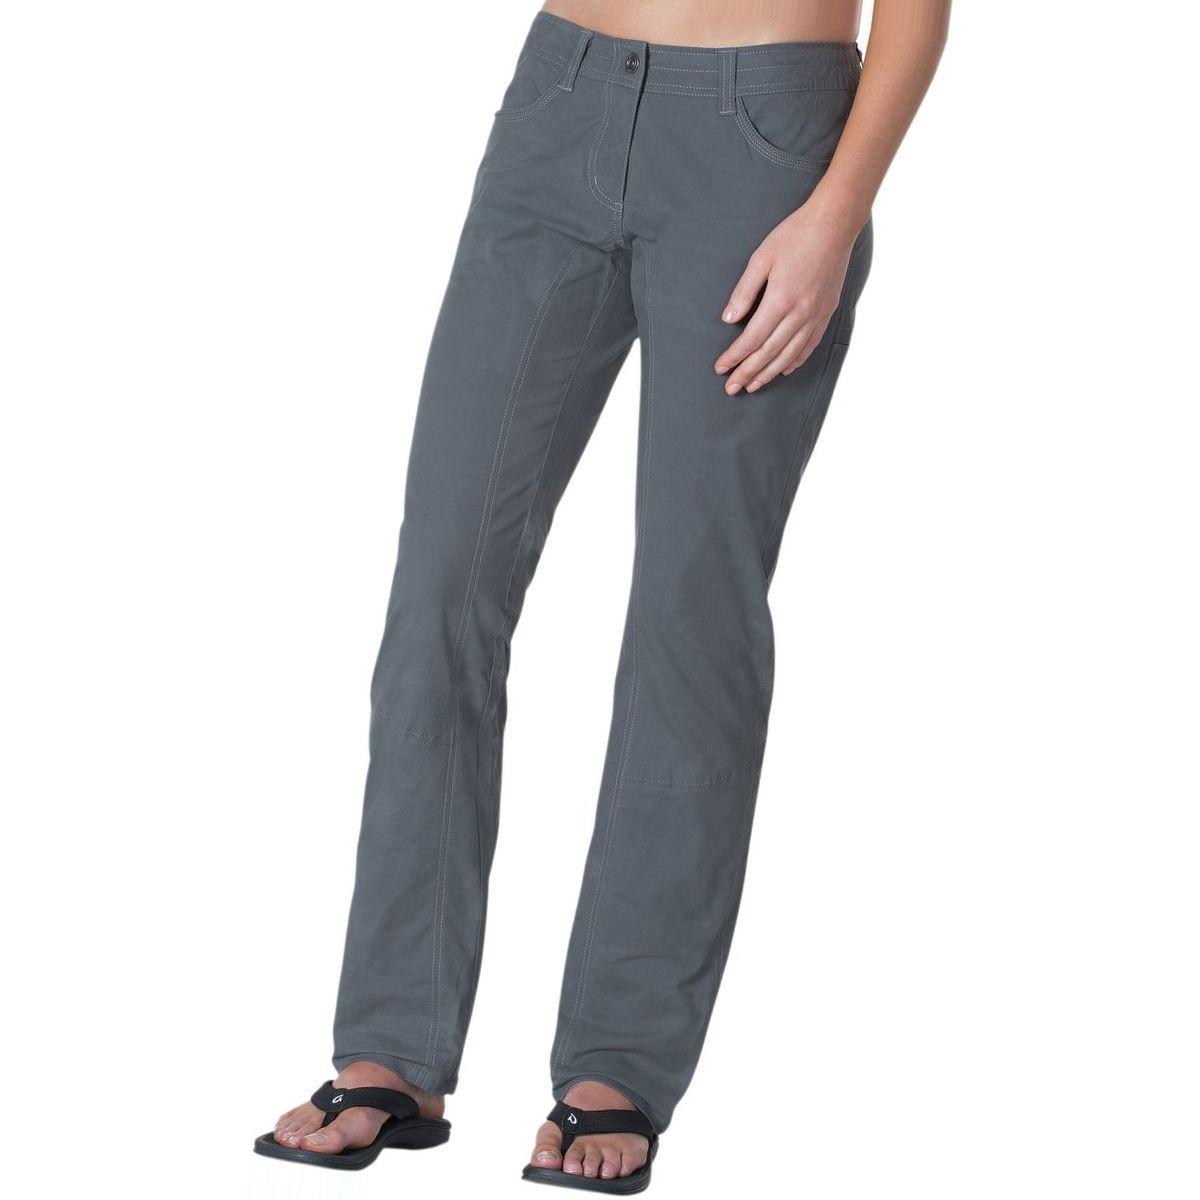 KUHL Inspiratr Straight Pant - Women's